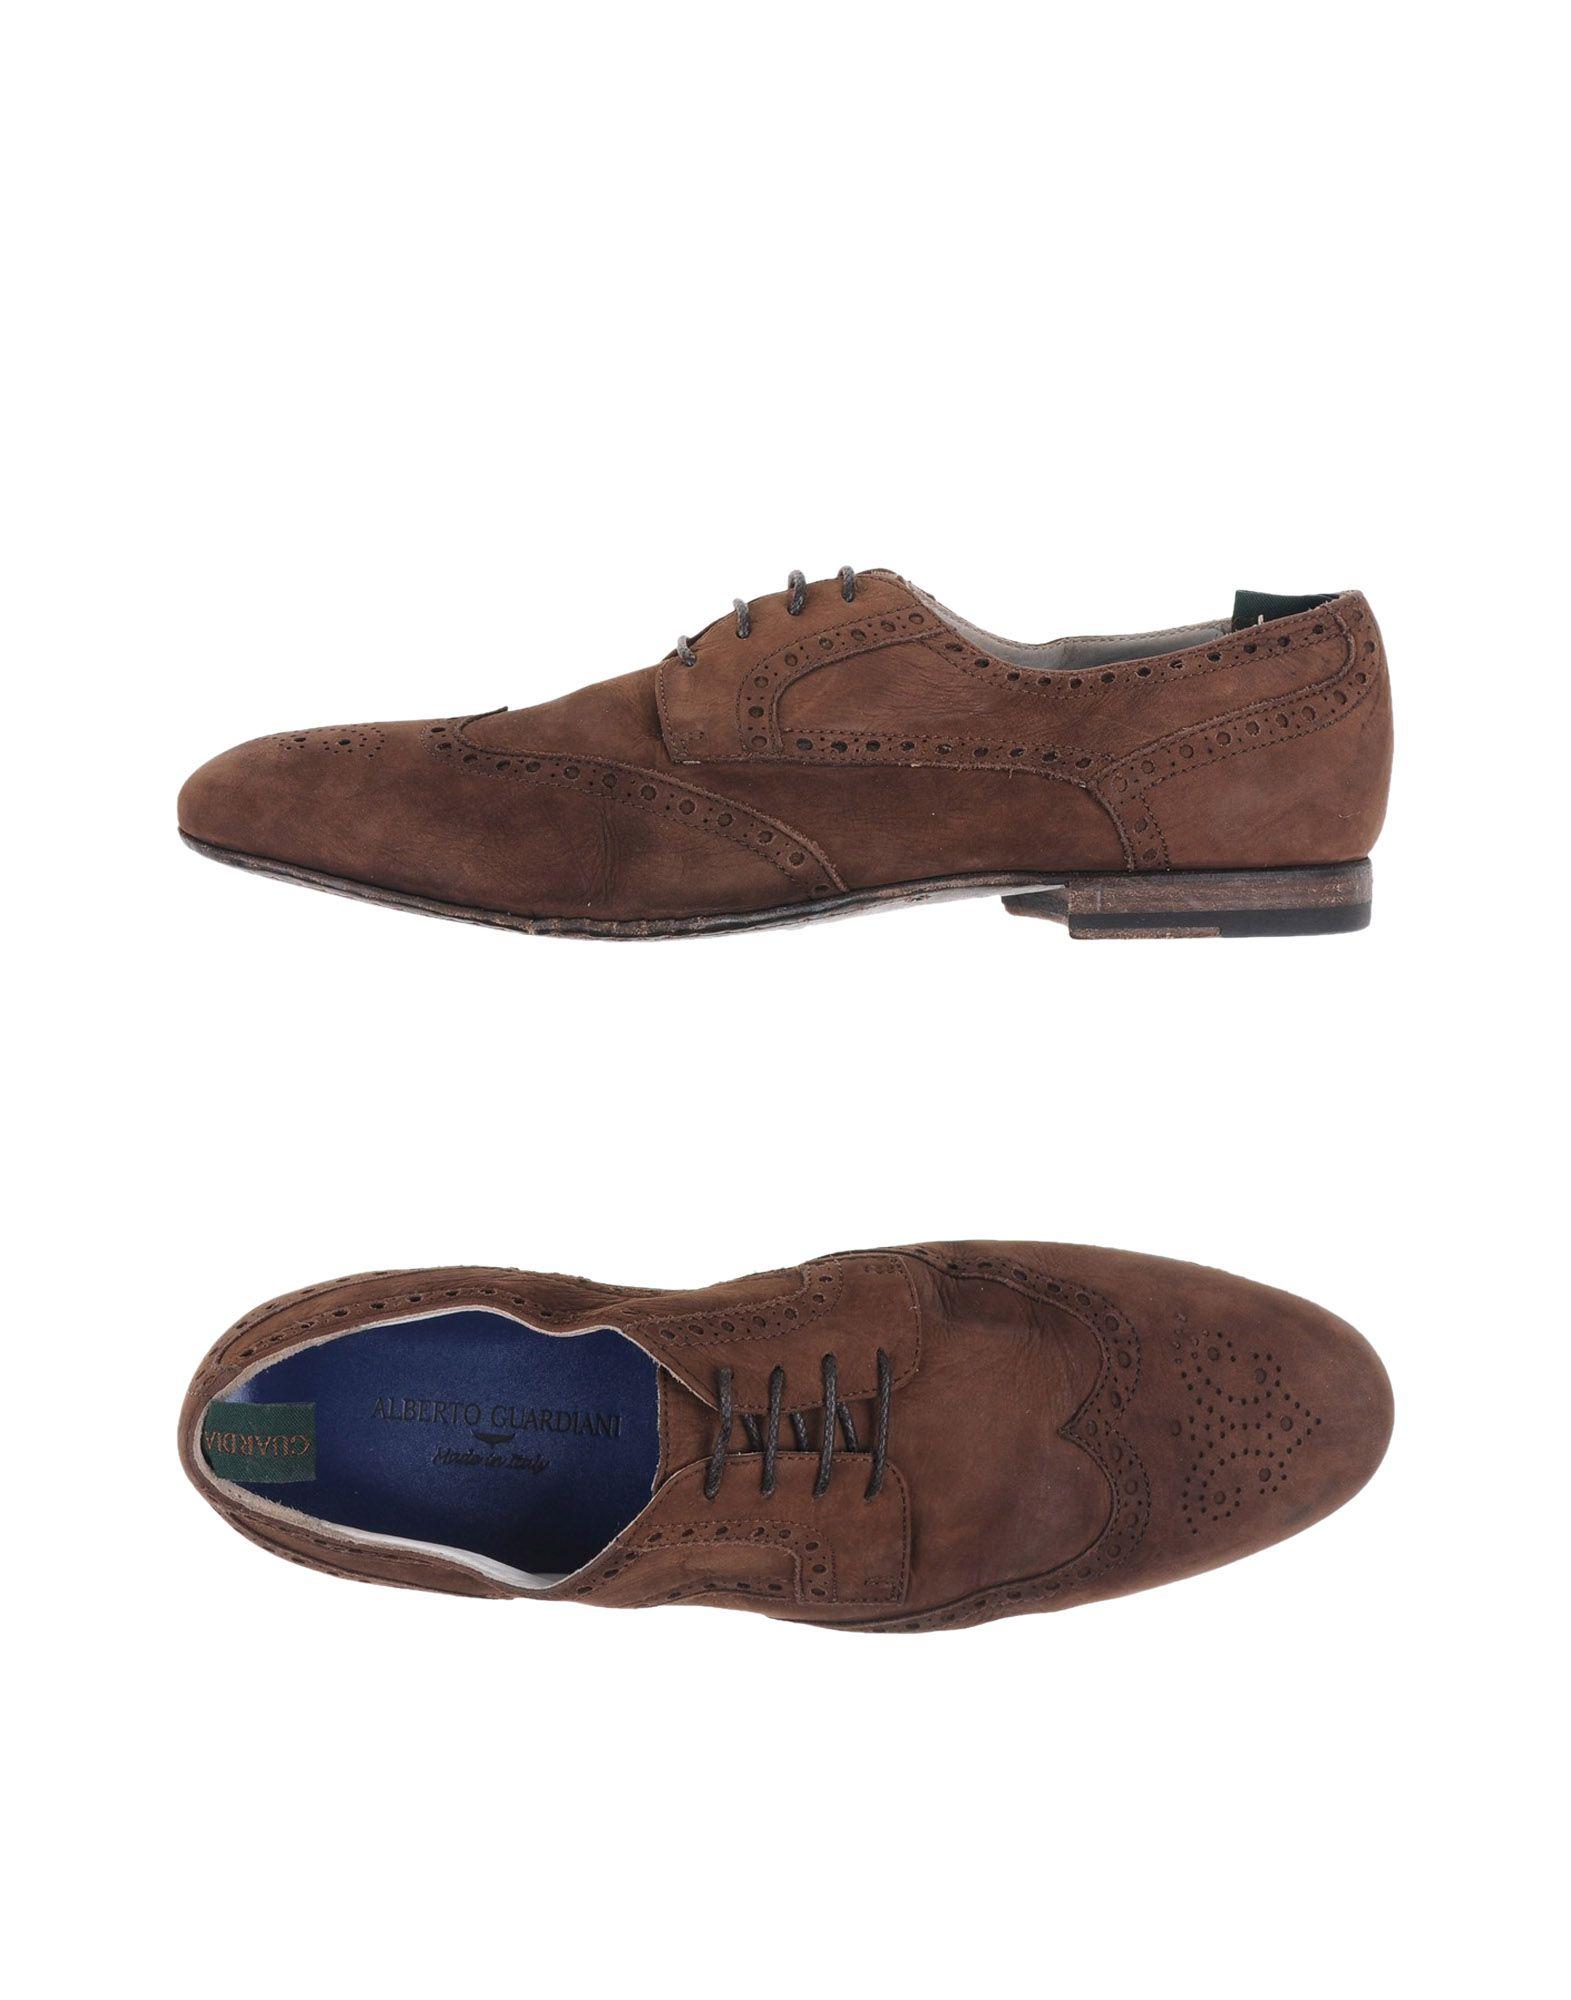 Alberto Guardiani Gute Schnürschuhe Herren  11047193NB Gute Guardiani Qualität beliebte Schuhe bf93be